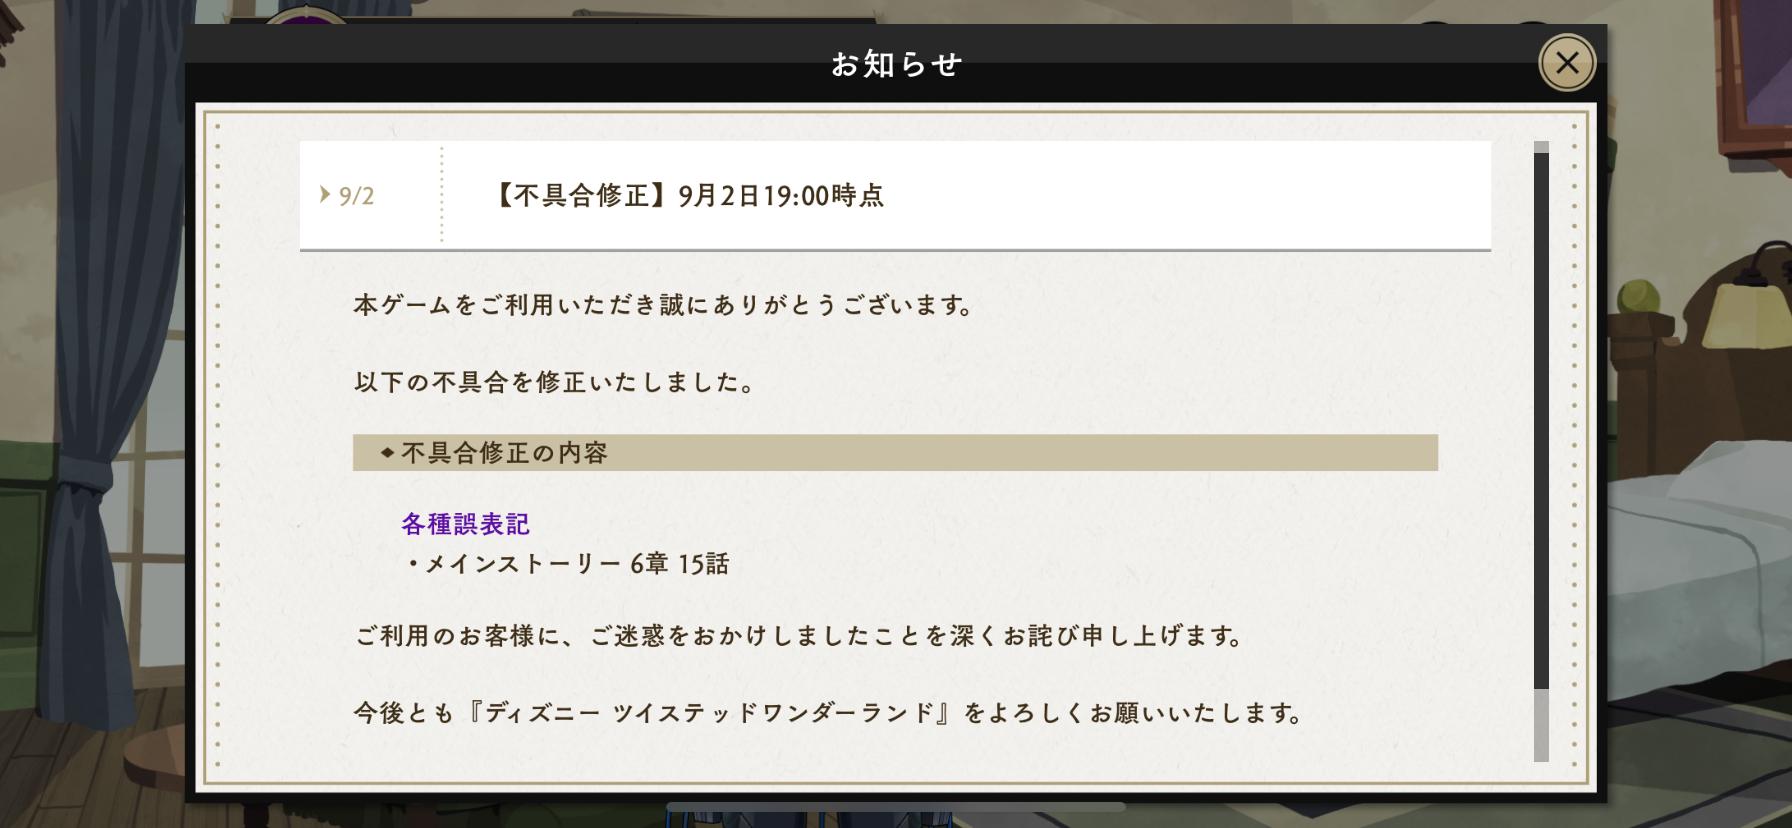 f:id:motimoti444:20210902191748p:plain